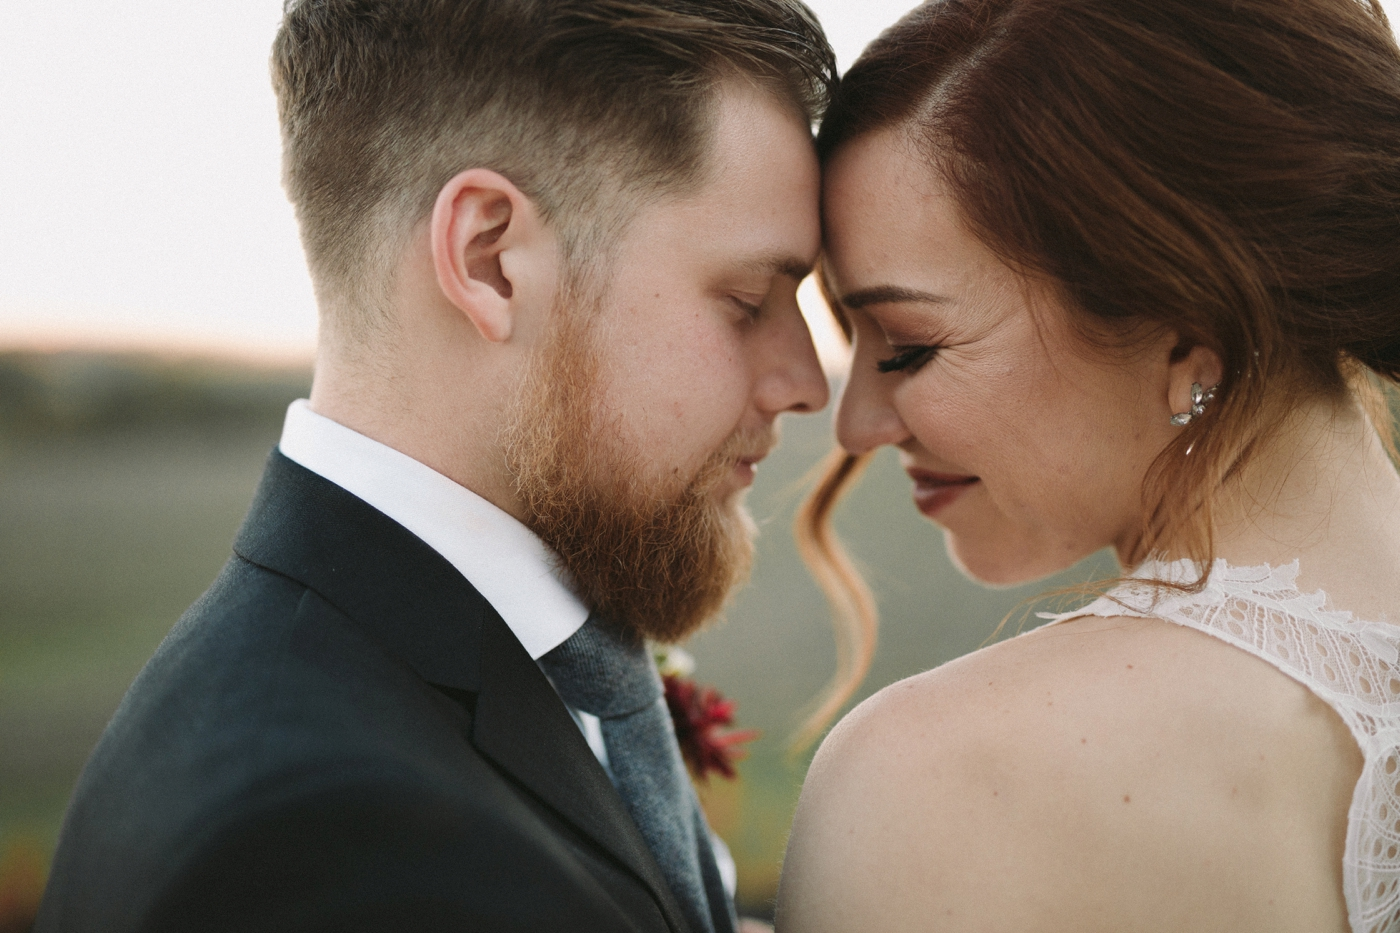 Erin & Ryan - Natural Wedding Photographer in Adelaide - Maximillians Wedding - Simple and Modern Wedding Photographer - Katherine Schultz - www.katherineschultzphotography.com_0050.jpg